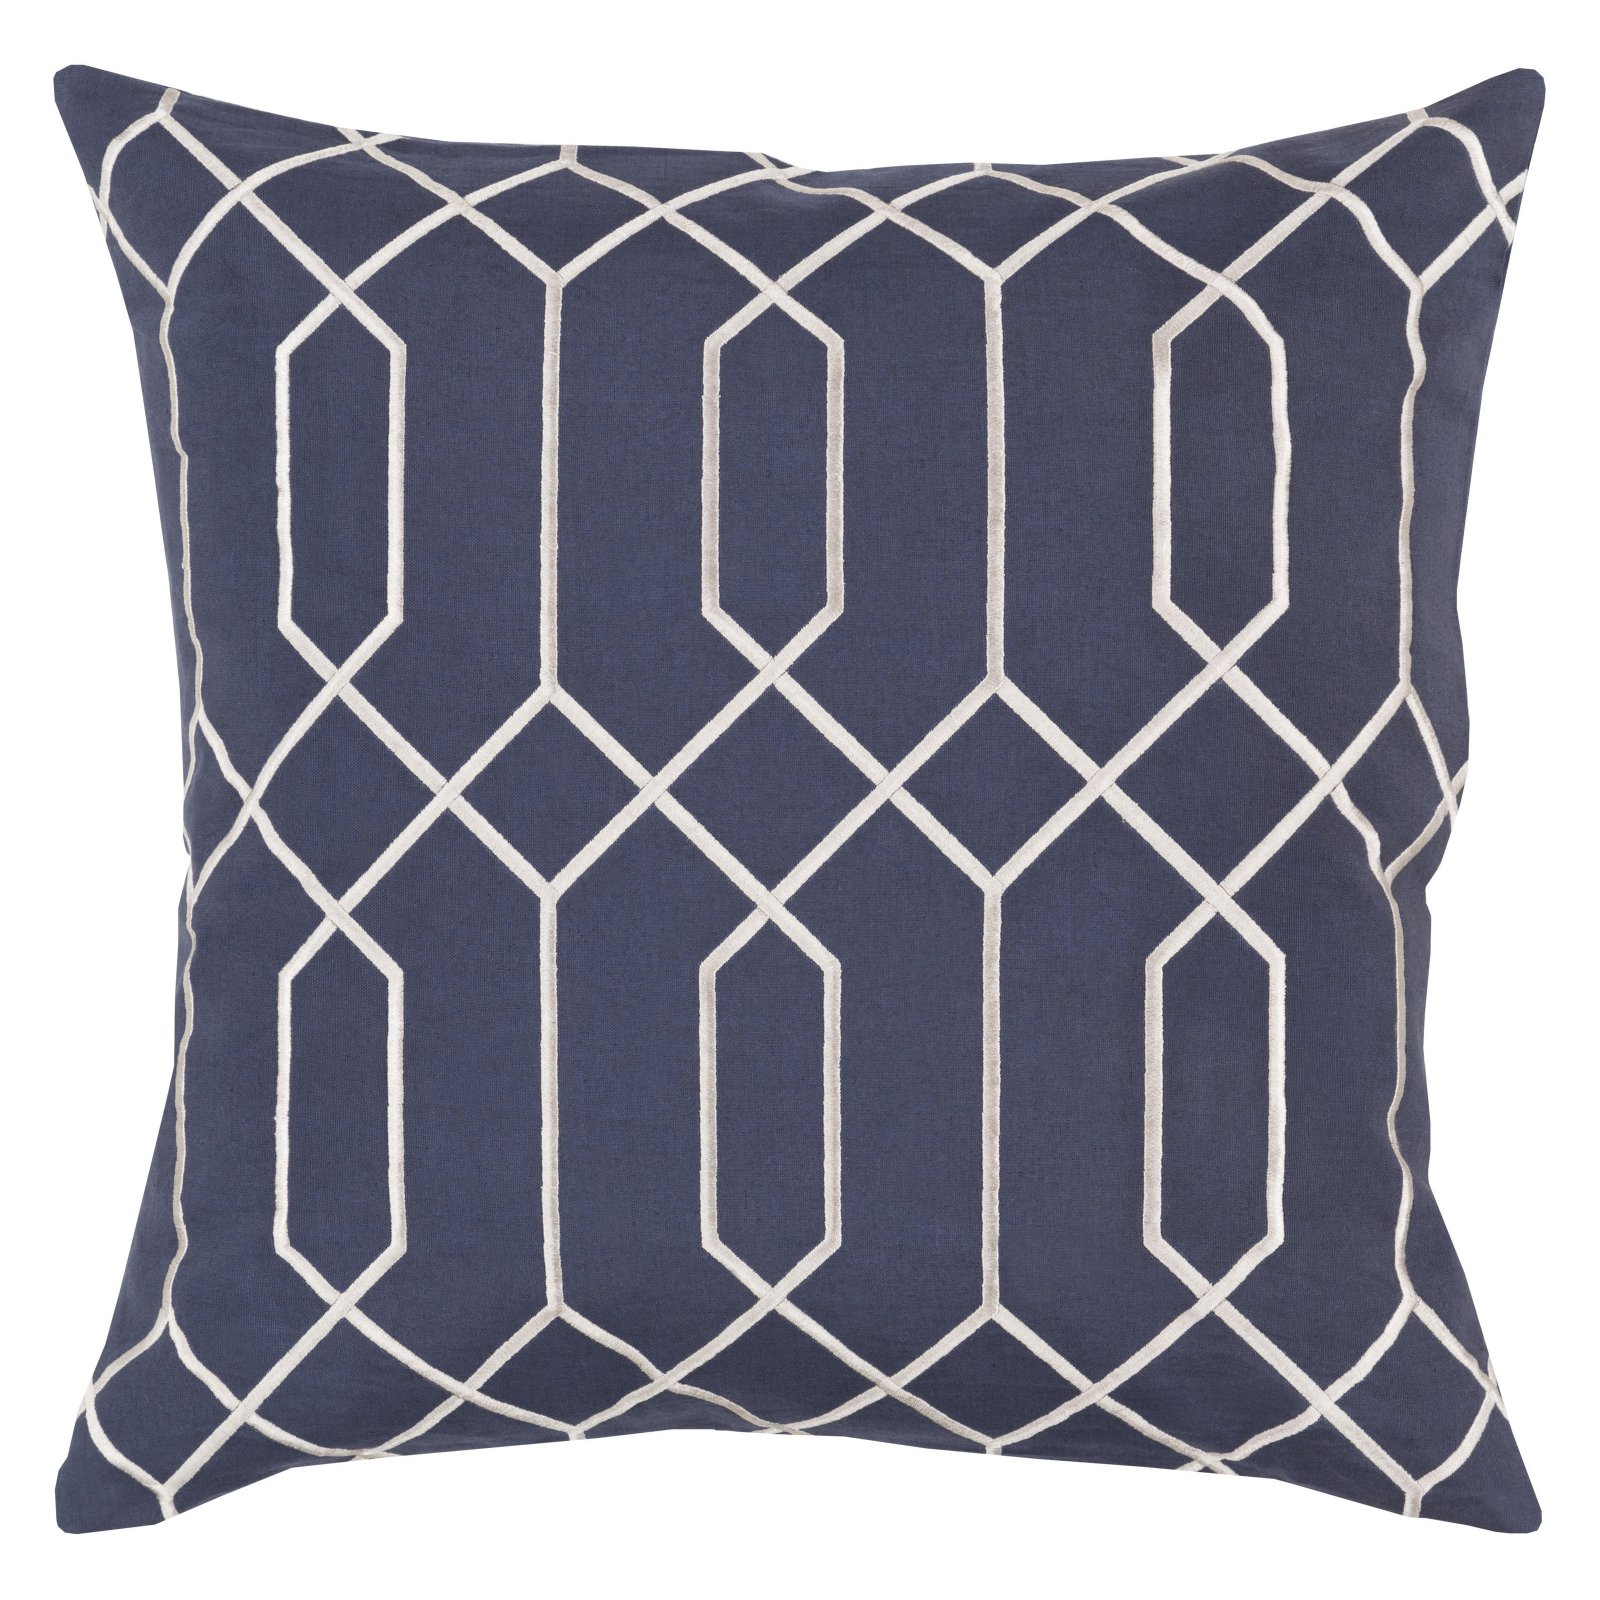 Surya Skyline V Decorative Throw Pillow